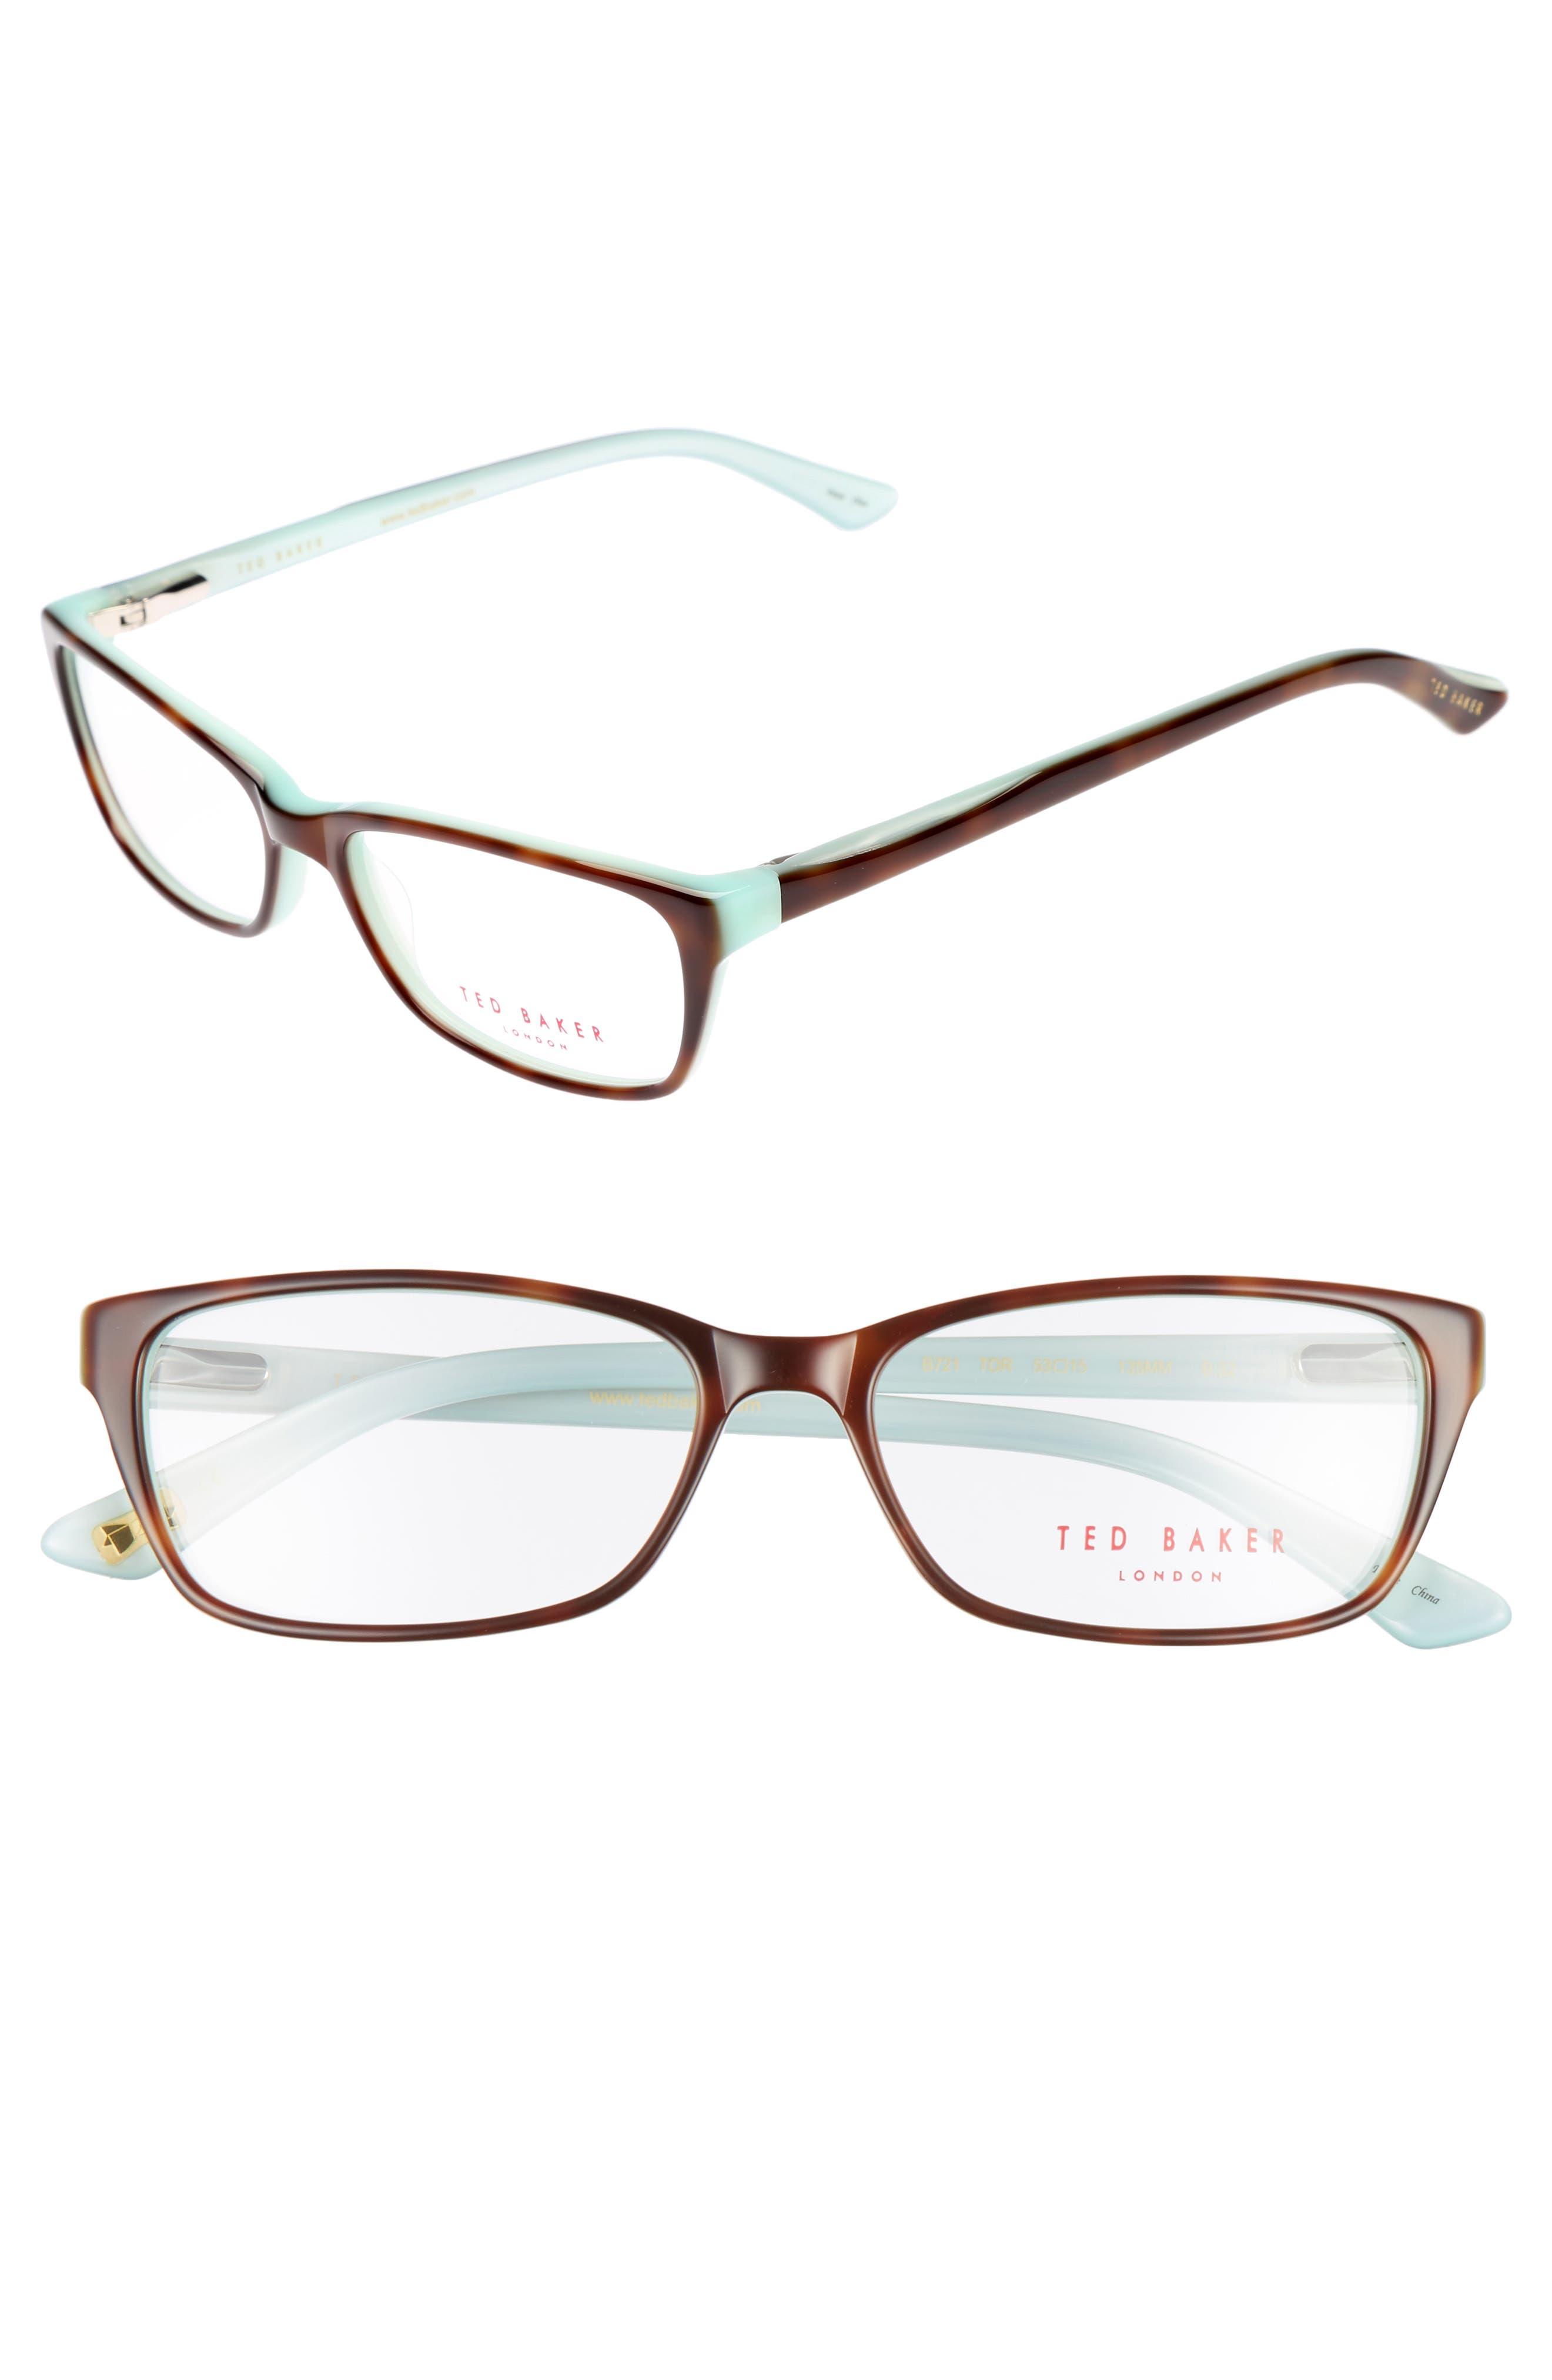 53mm Optical Glasses,                             Main thumbnail 1, color,                             Brown